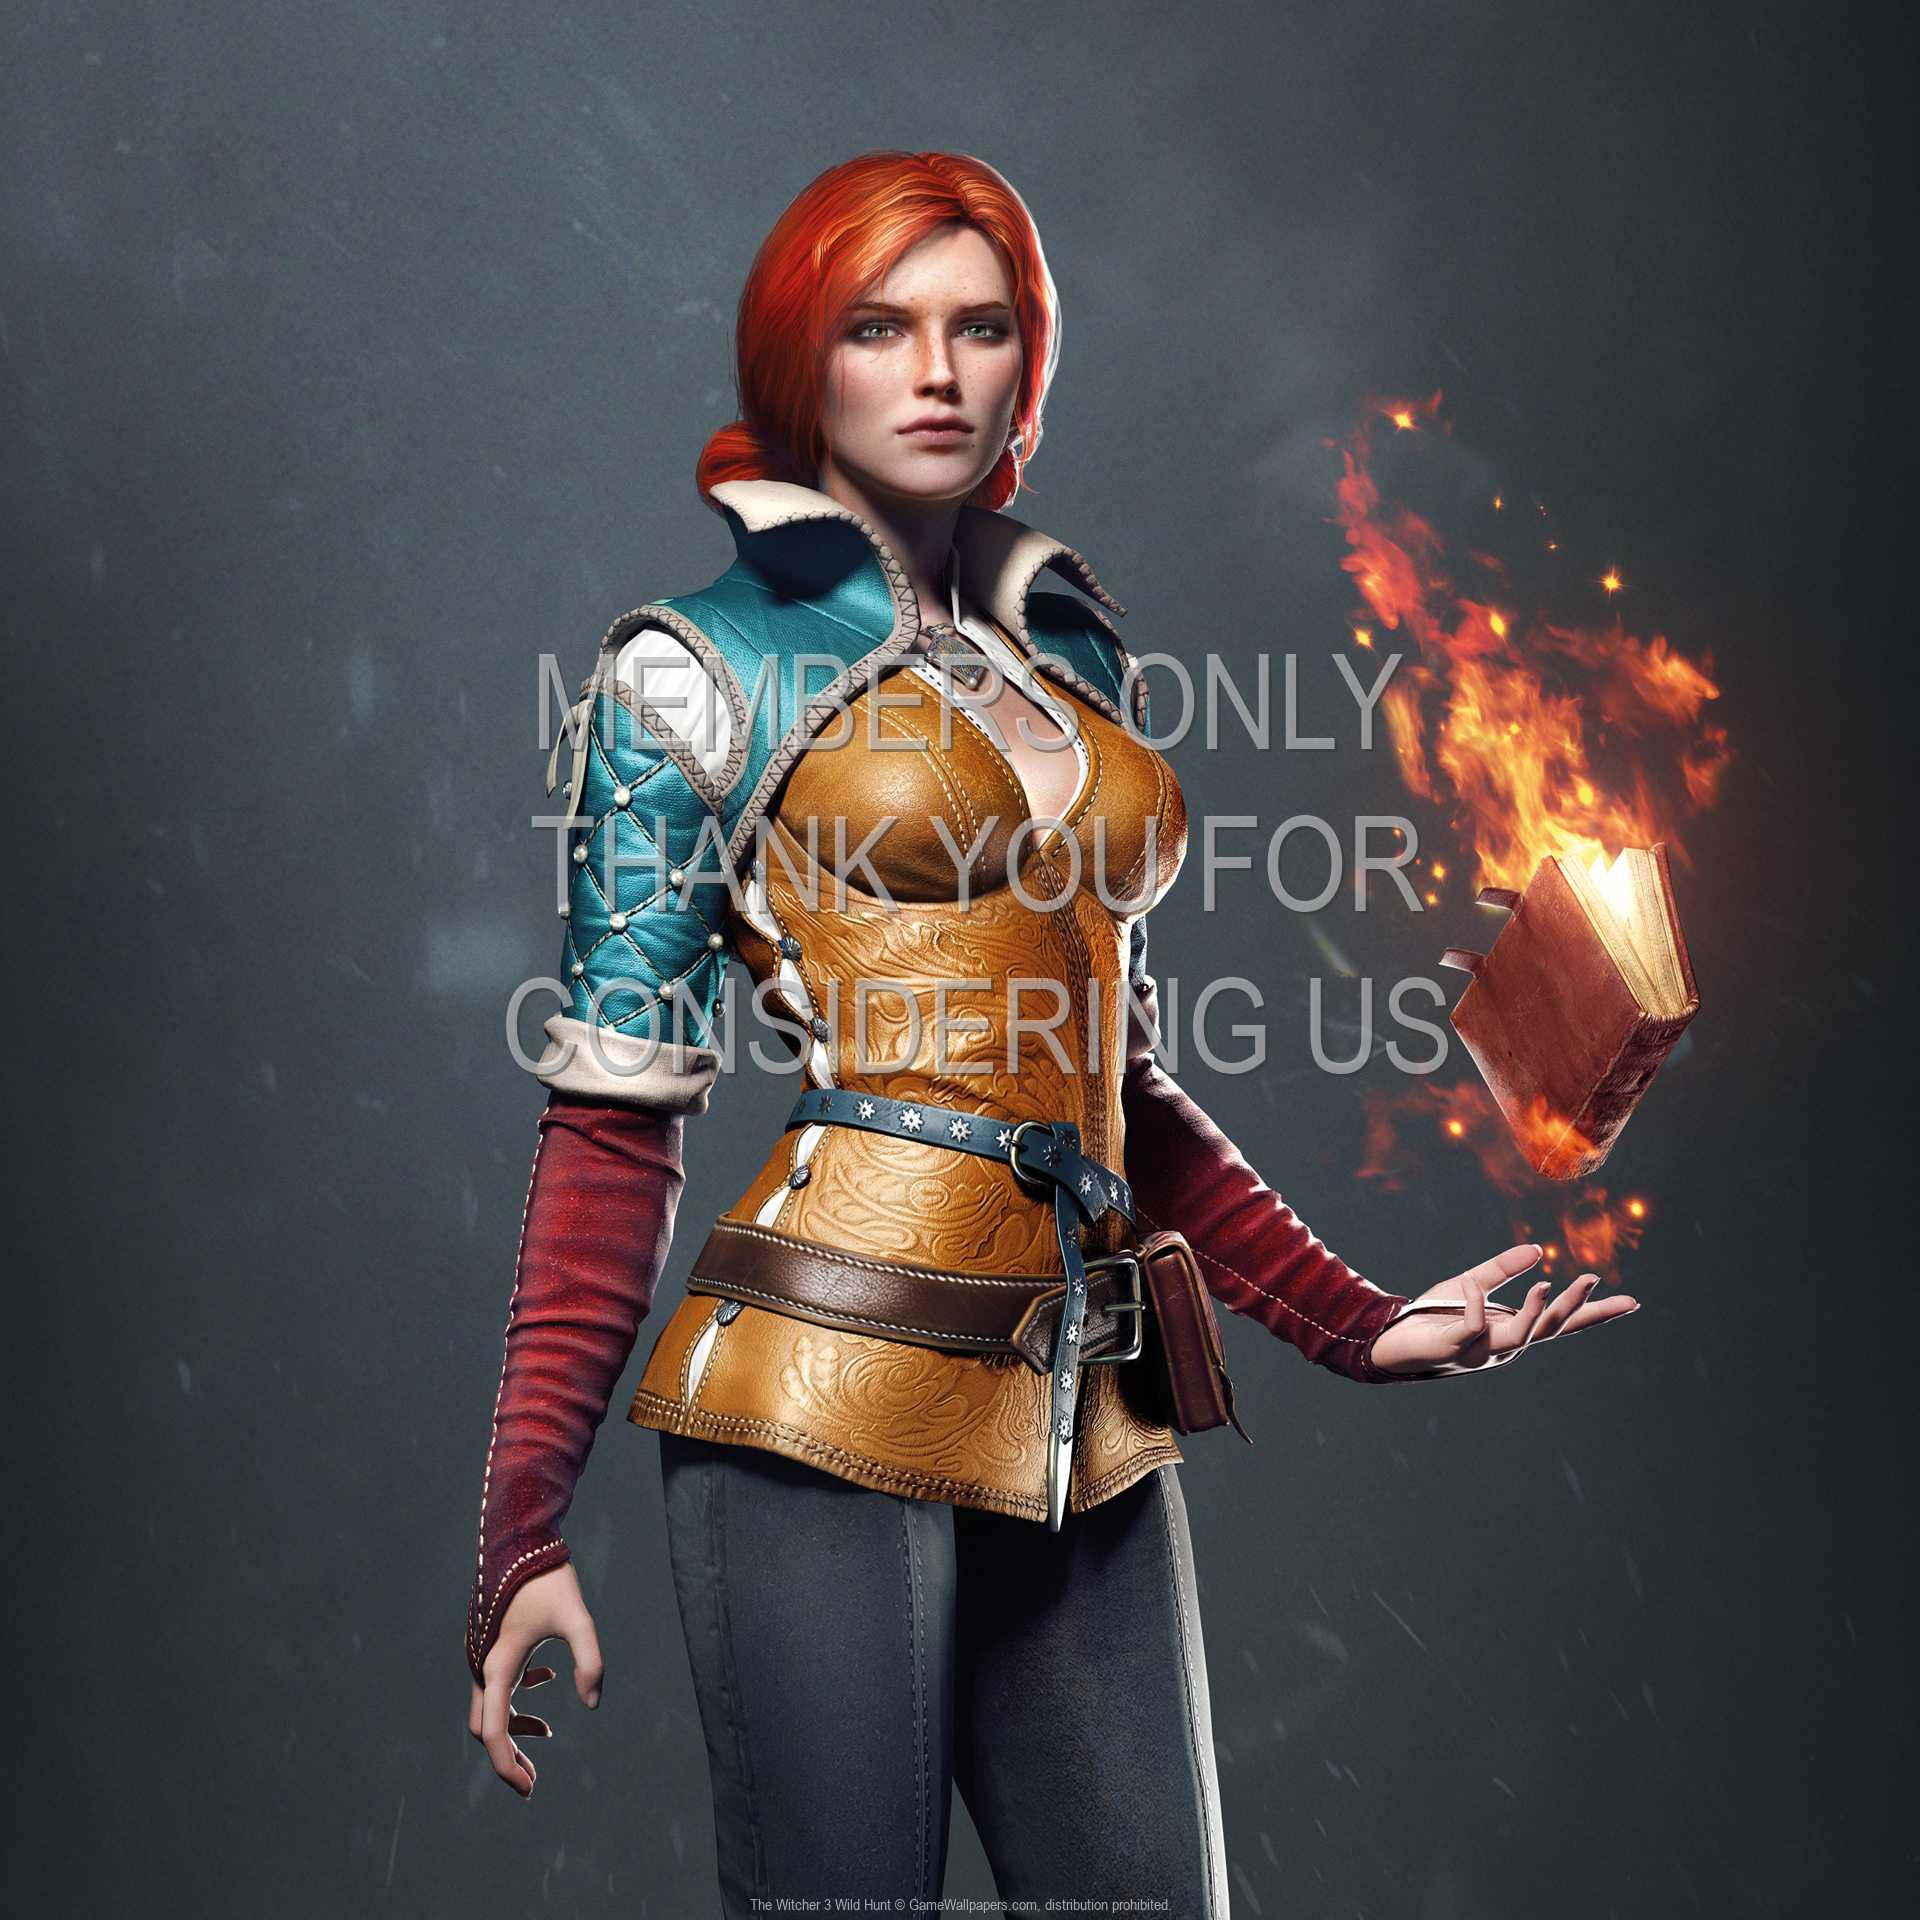 The Witcher 3: Wild Hunt 1080p Horizontal Handy Hintergrundbild 12